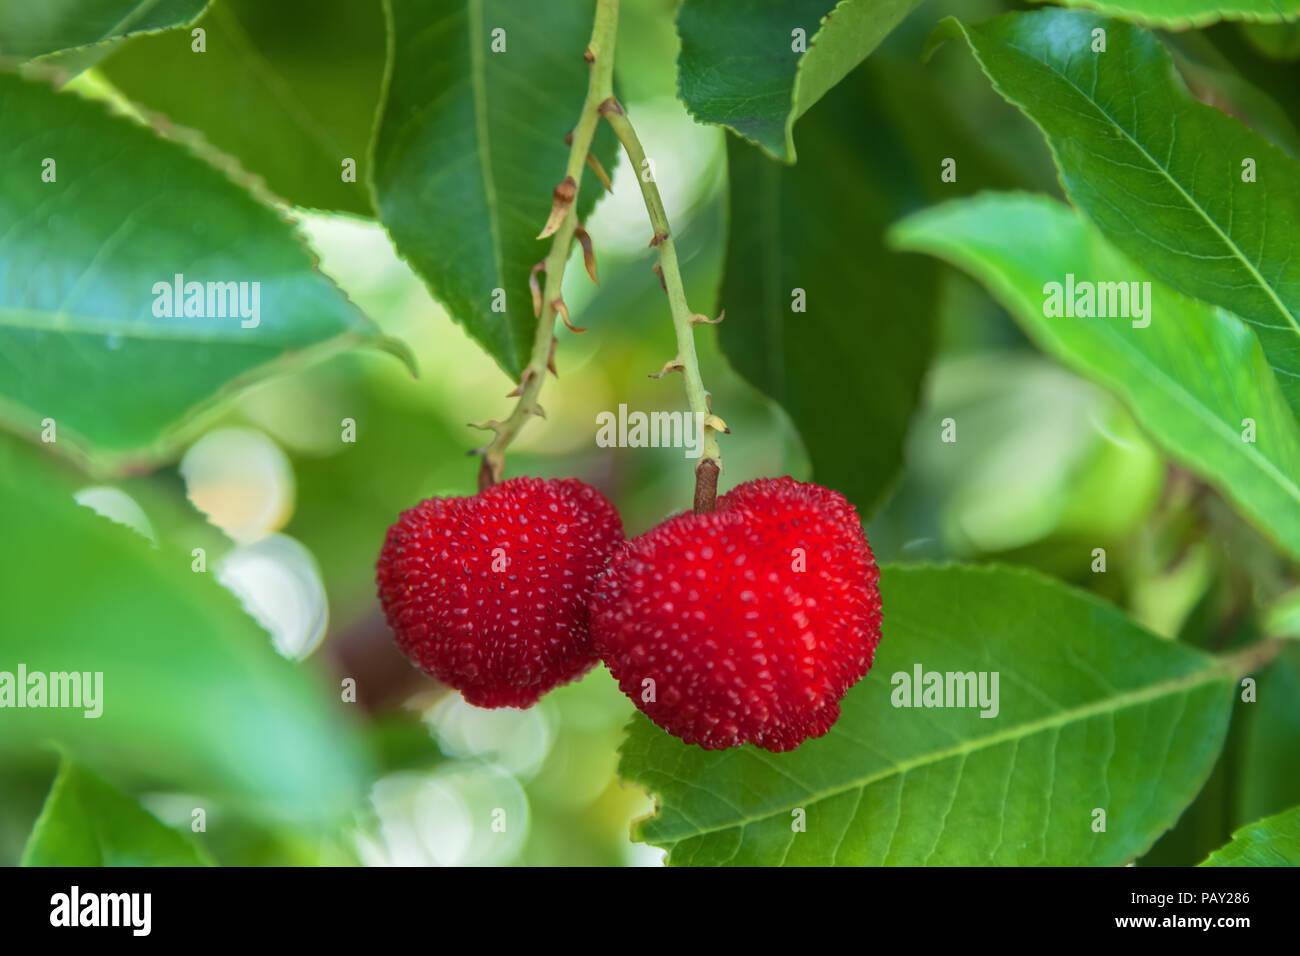 Ripe strawberry tree fruit, San Francisco, California, United States. - Stock Image